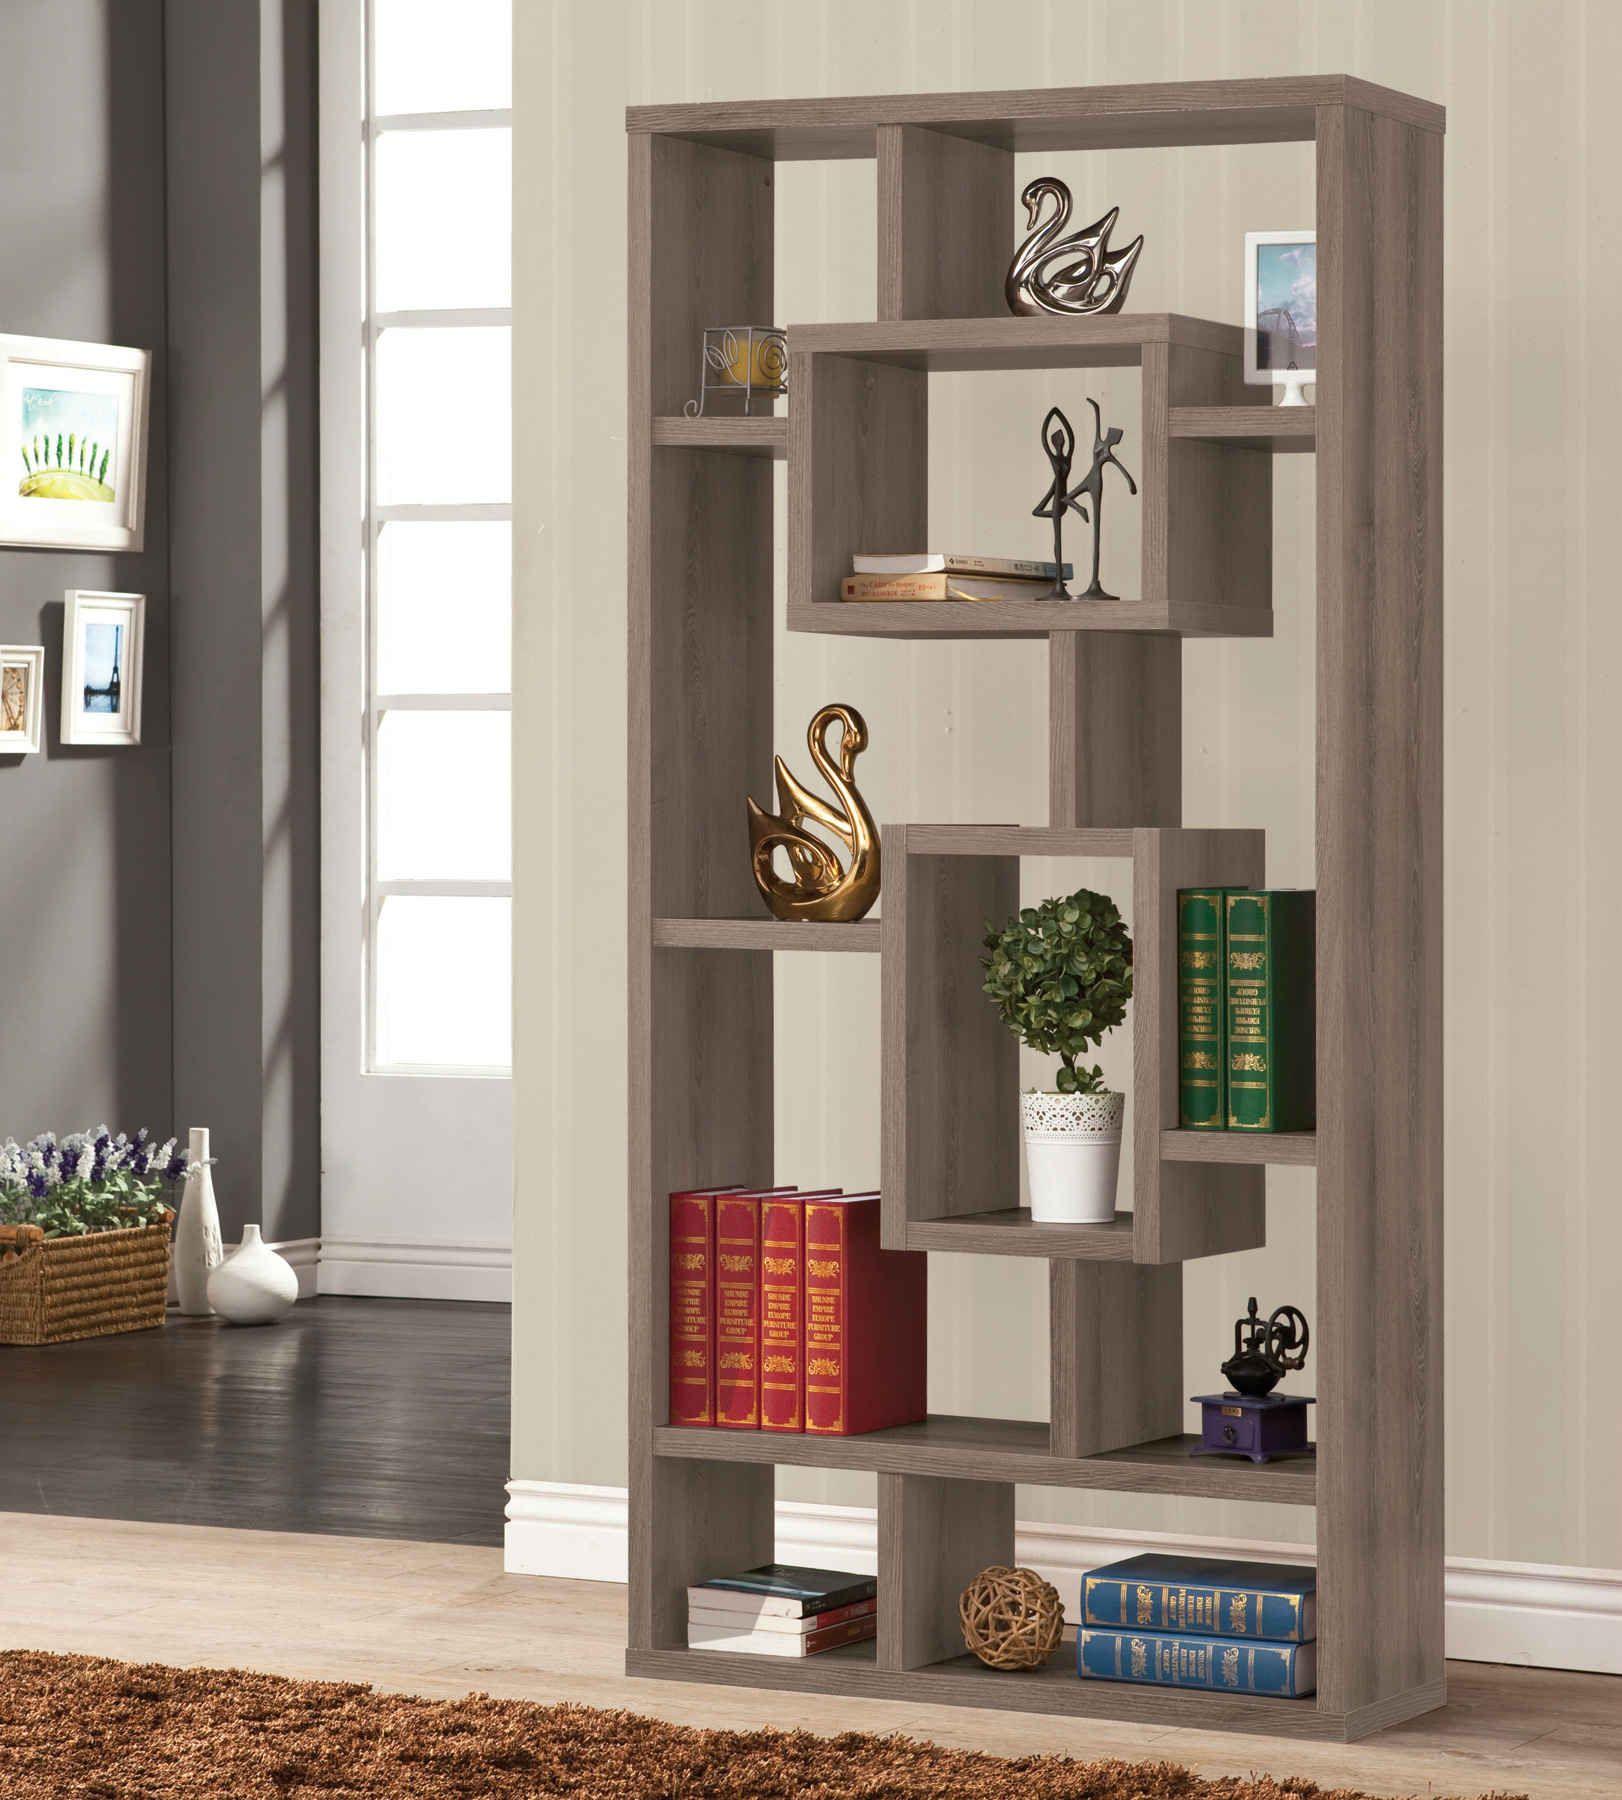 Repisas estante separador casa pinterest modern shelves